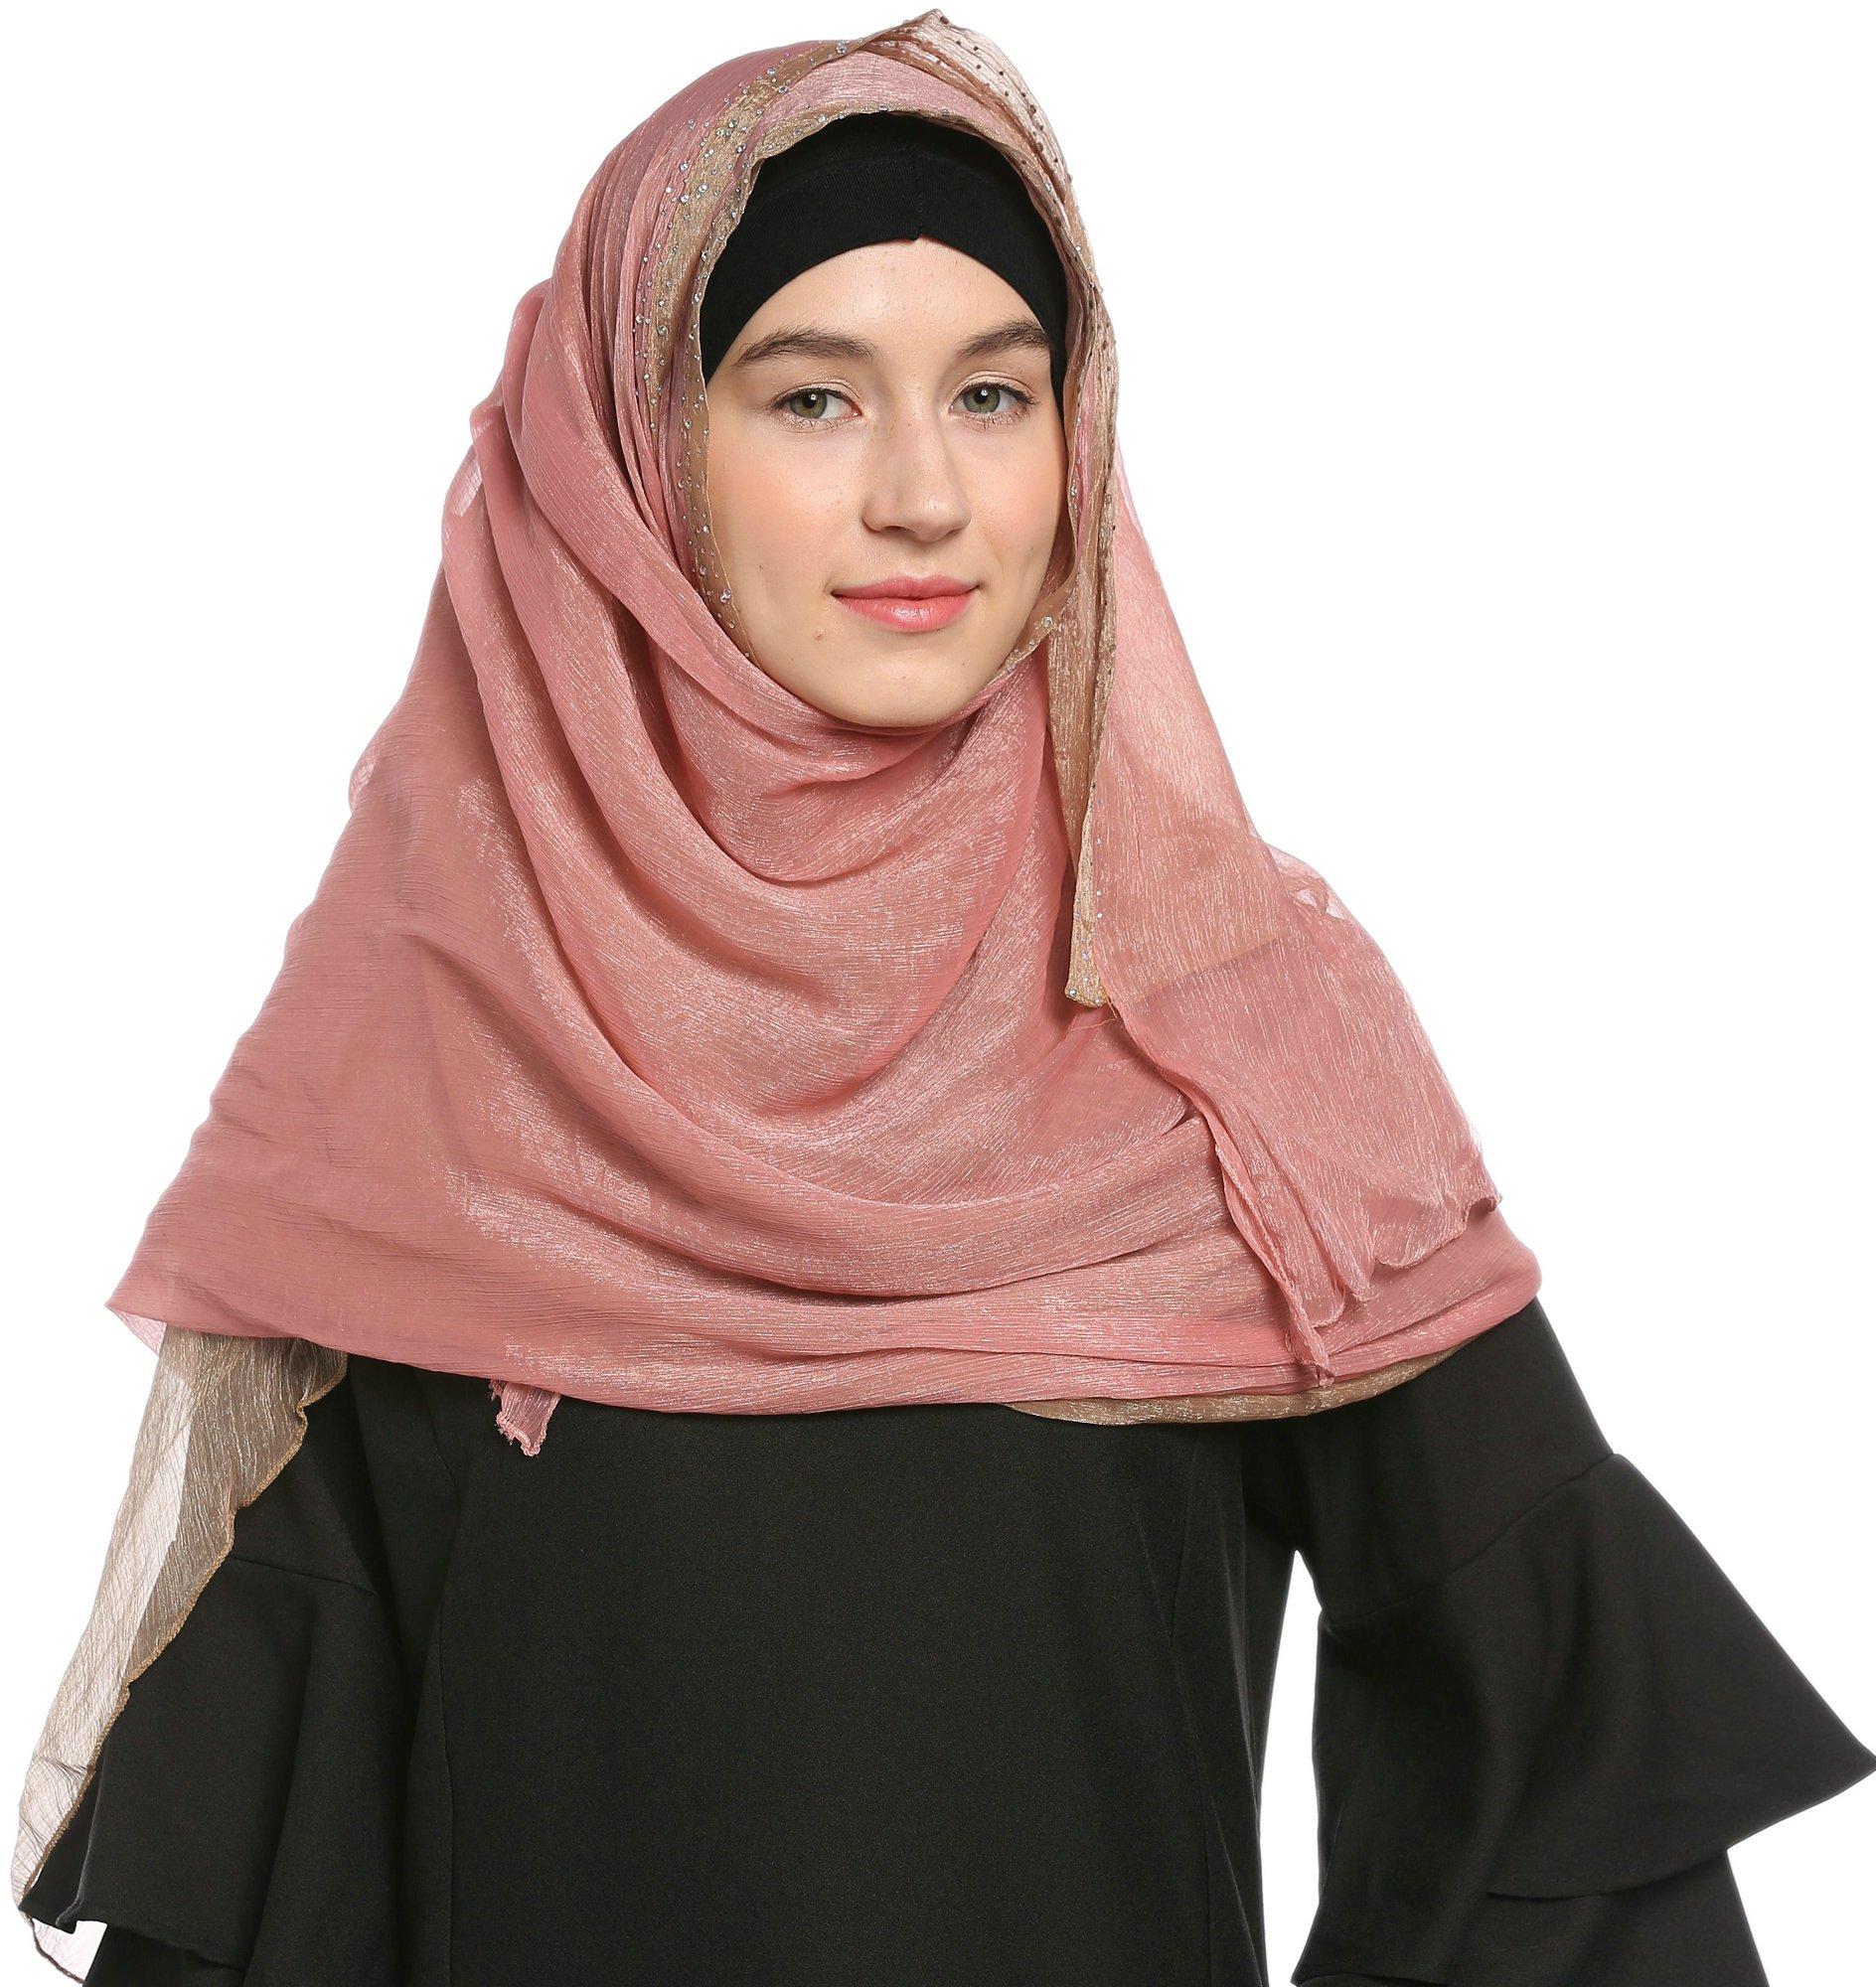 Ababalaya Lace Decorated Wedding Hijab Islamic Hijab,Color3 by Ababalaya (Image #6)